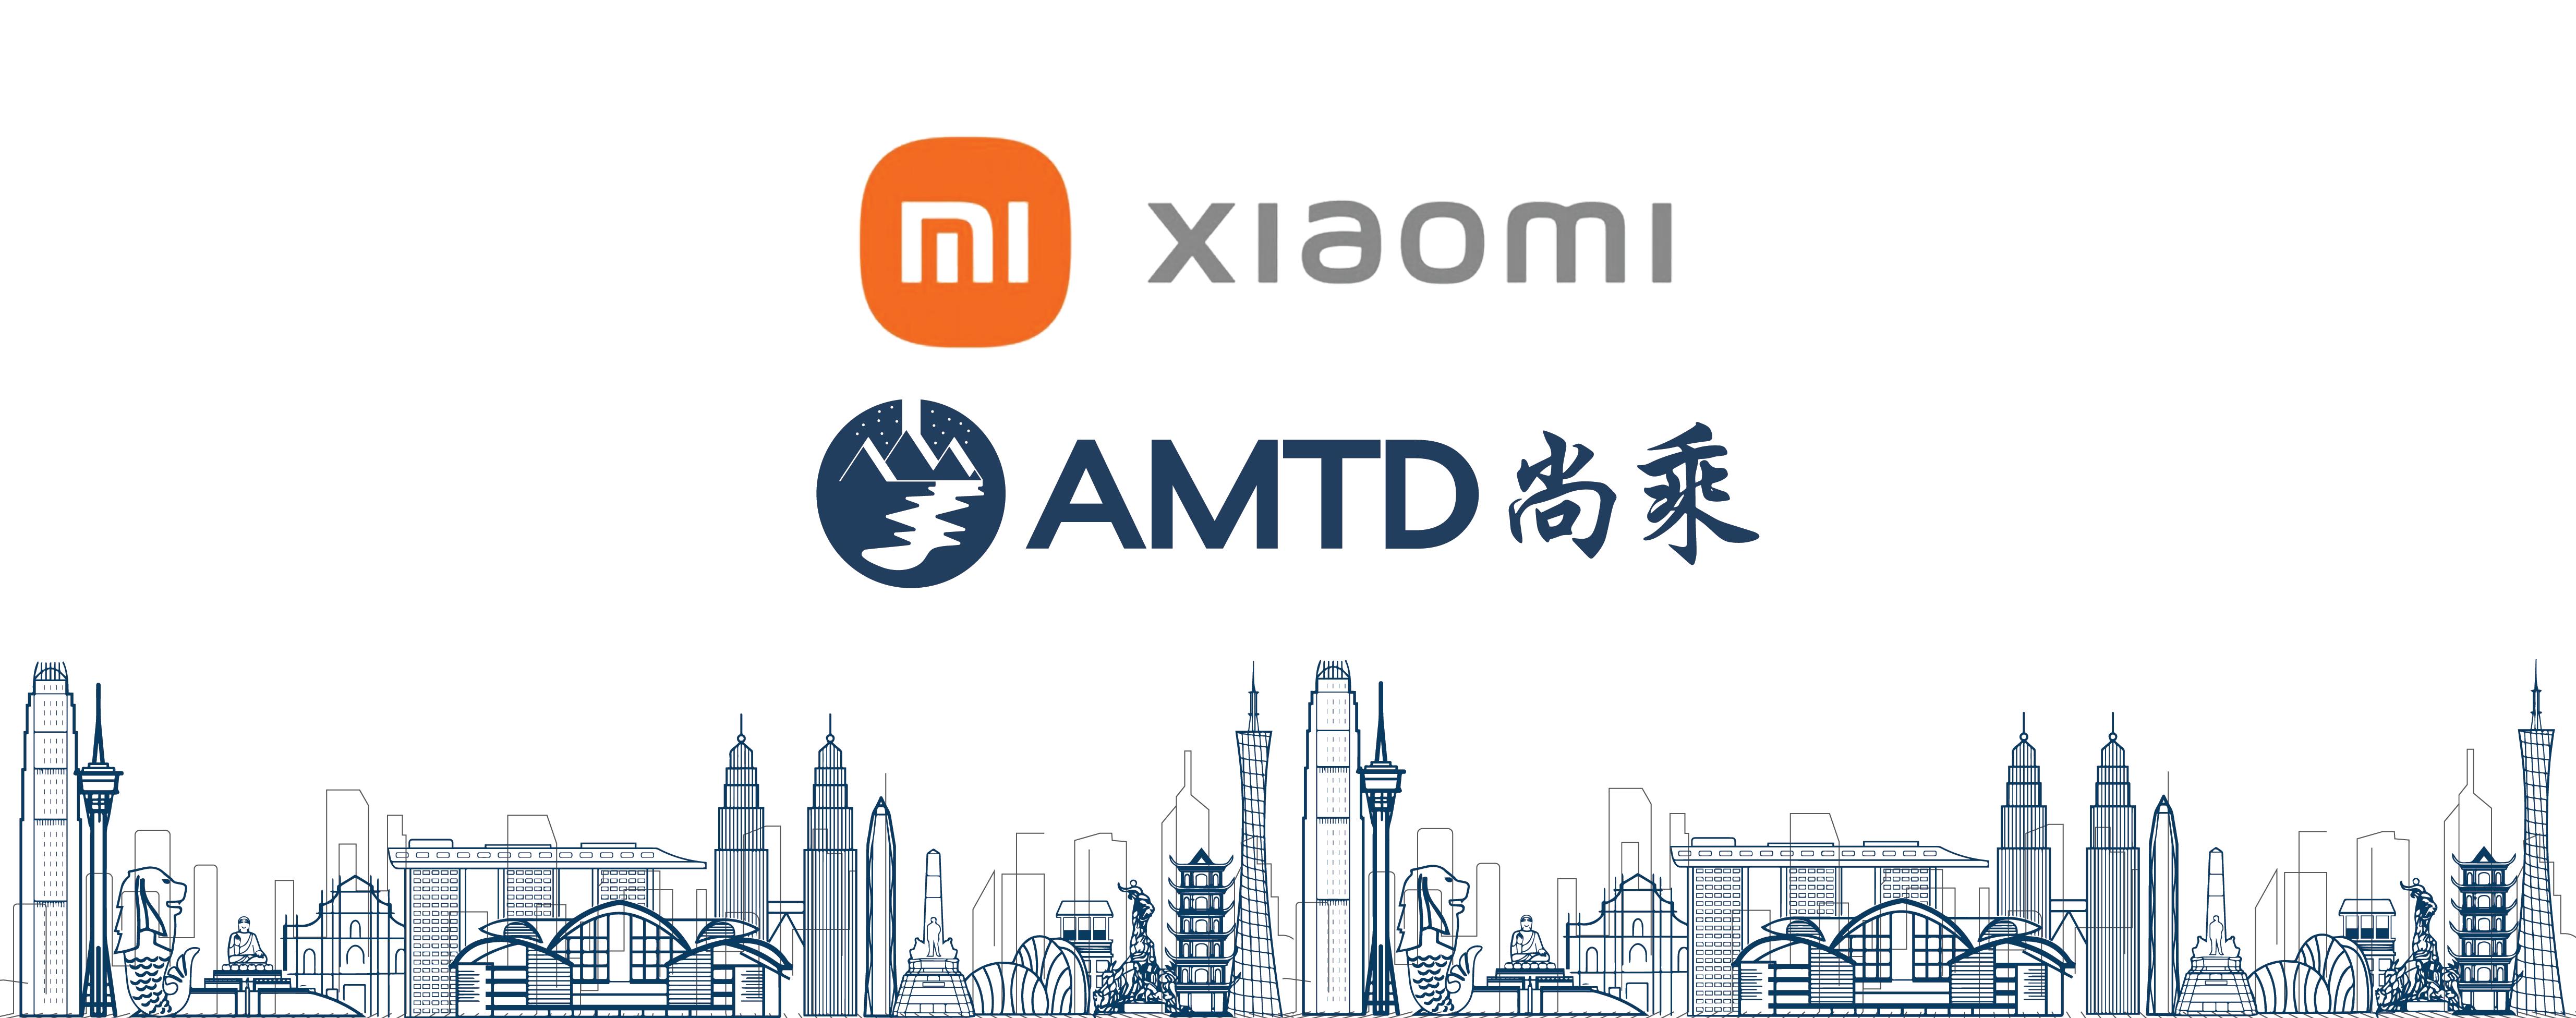 AMTD Deals | Xiaomi's US$1.2bn Senior Bond and Green Bond Offering